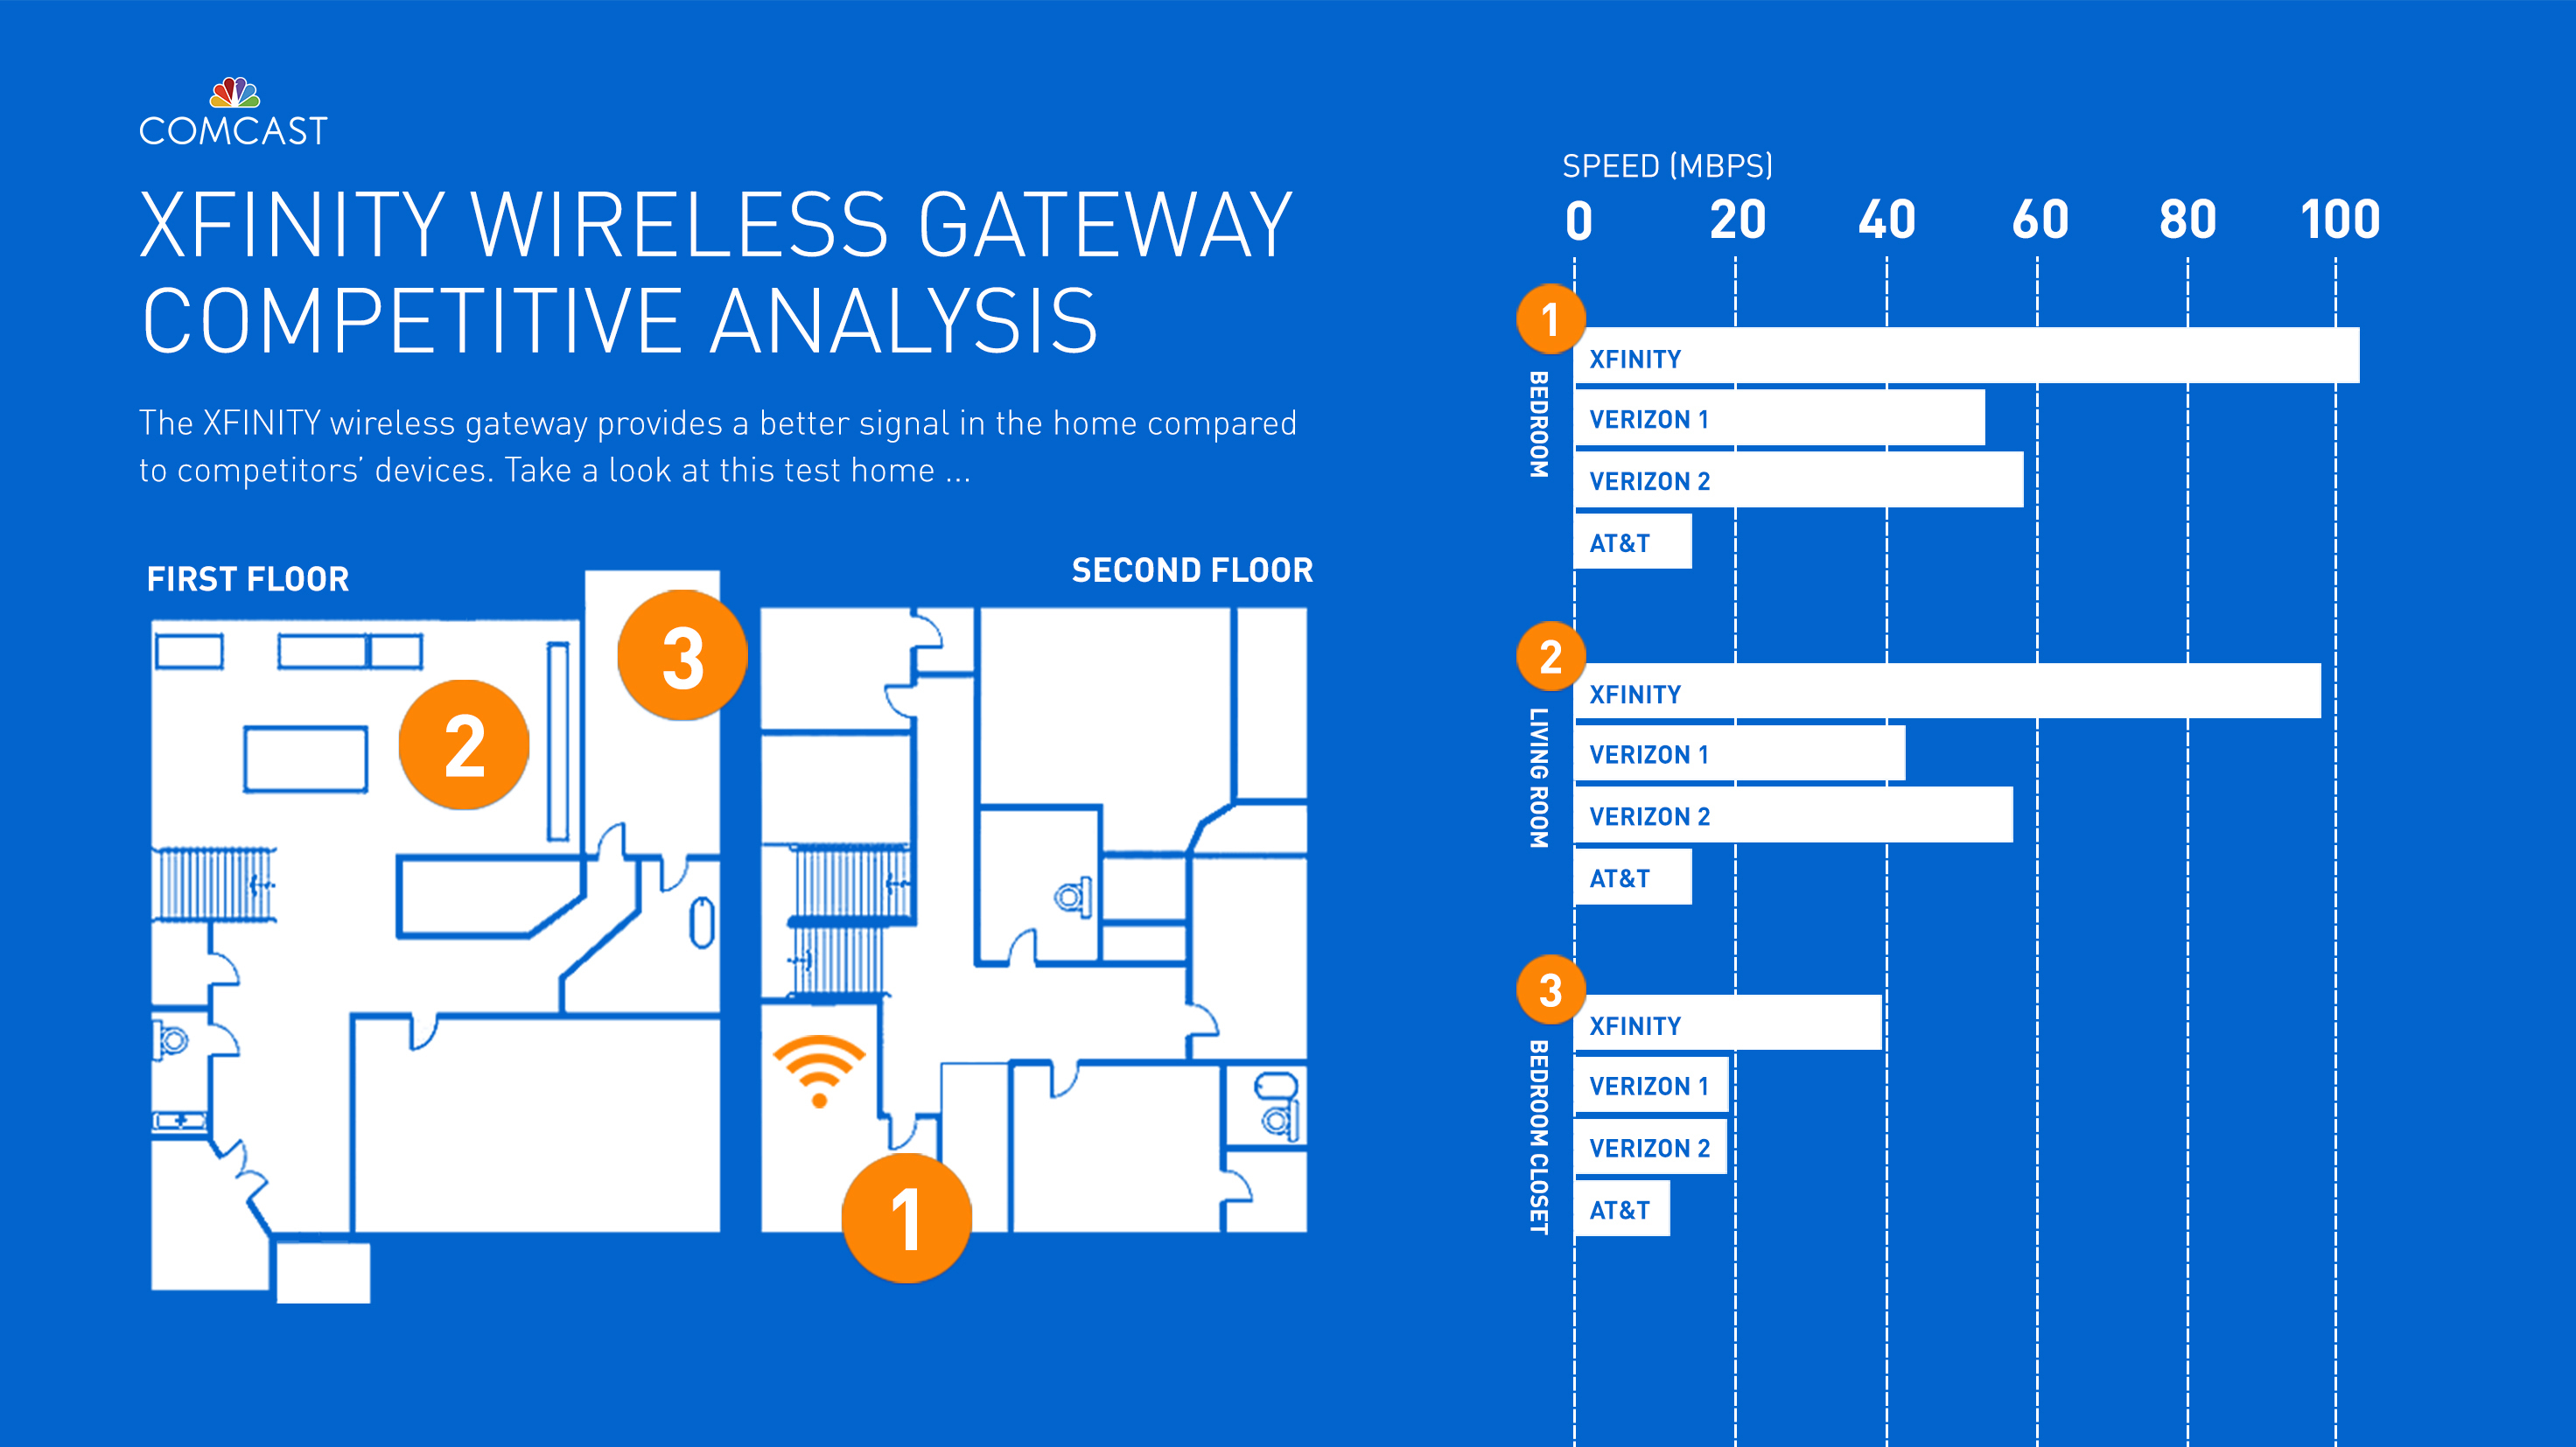 comcast wireless diagram wiring diagrams source comcast cable modem setup diagram comcast wireless diagram [ 2944 x 1654 Pixel ]